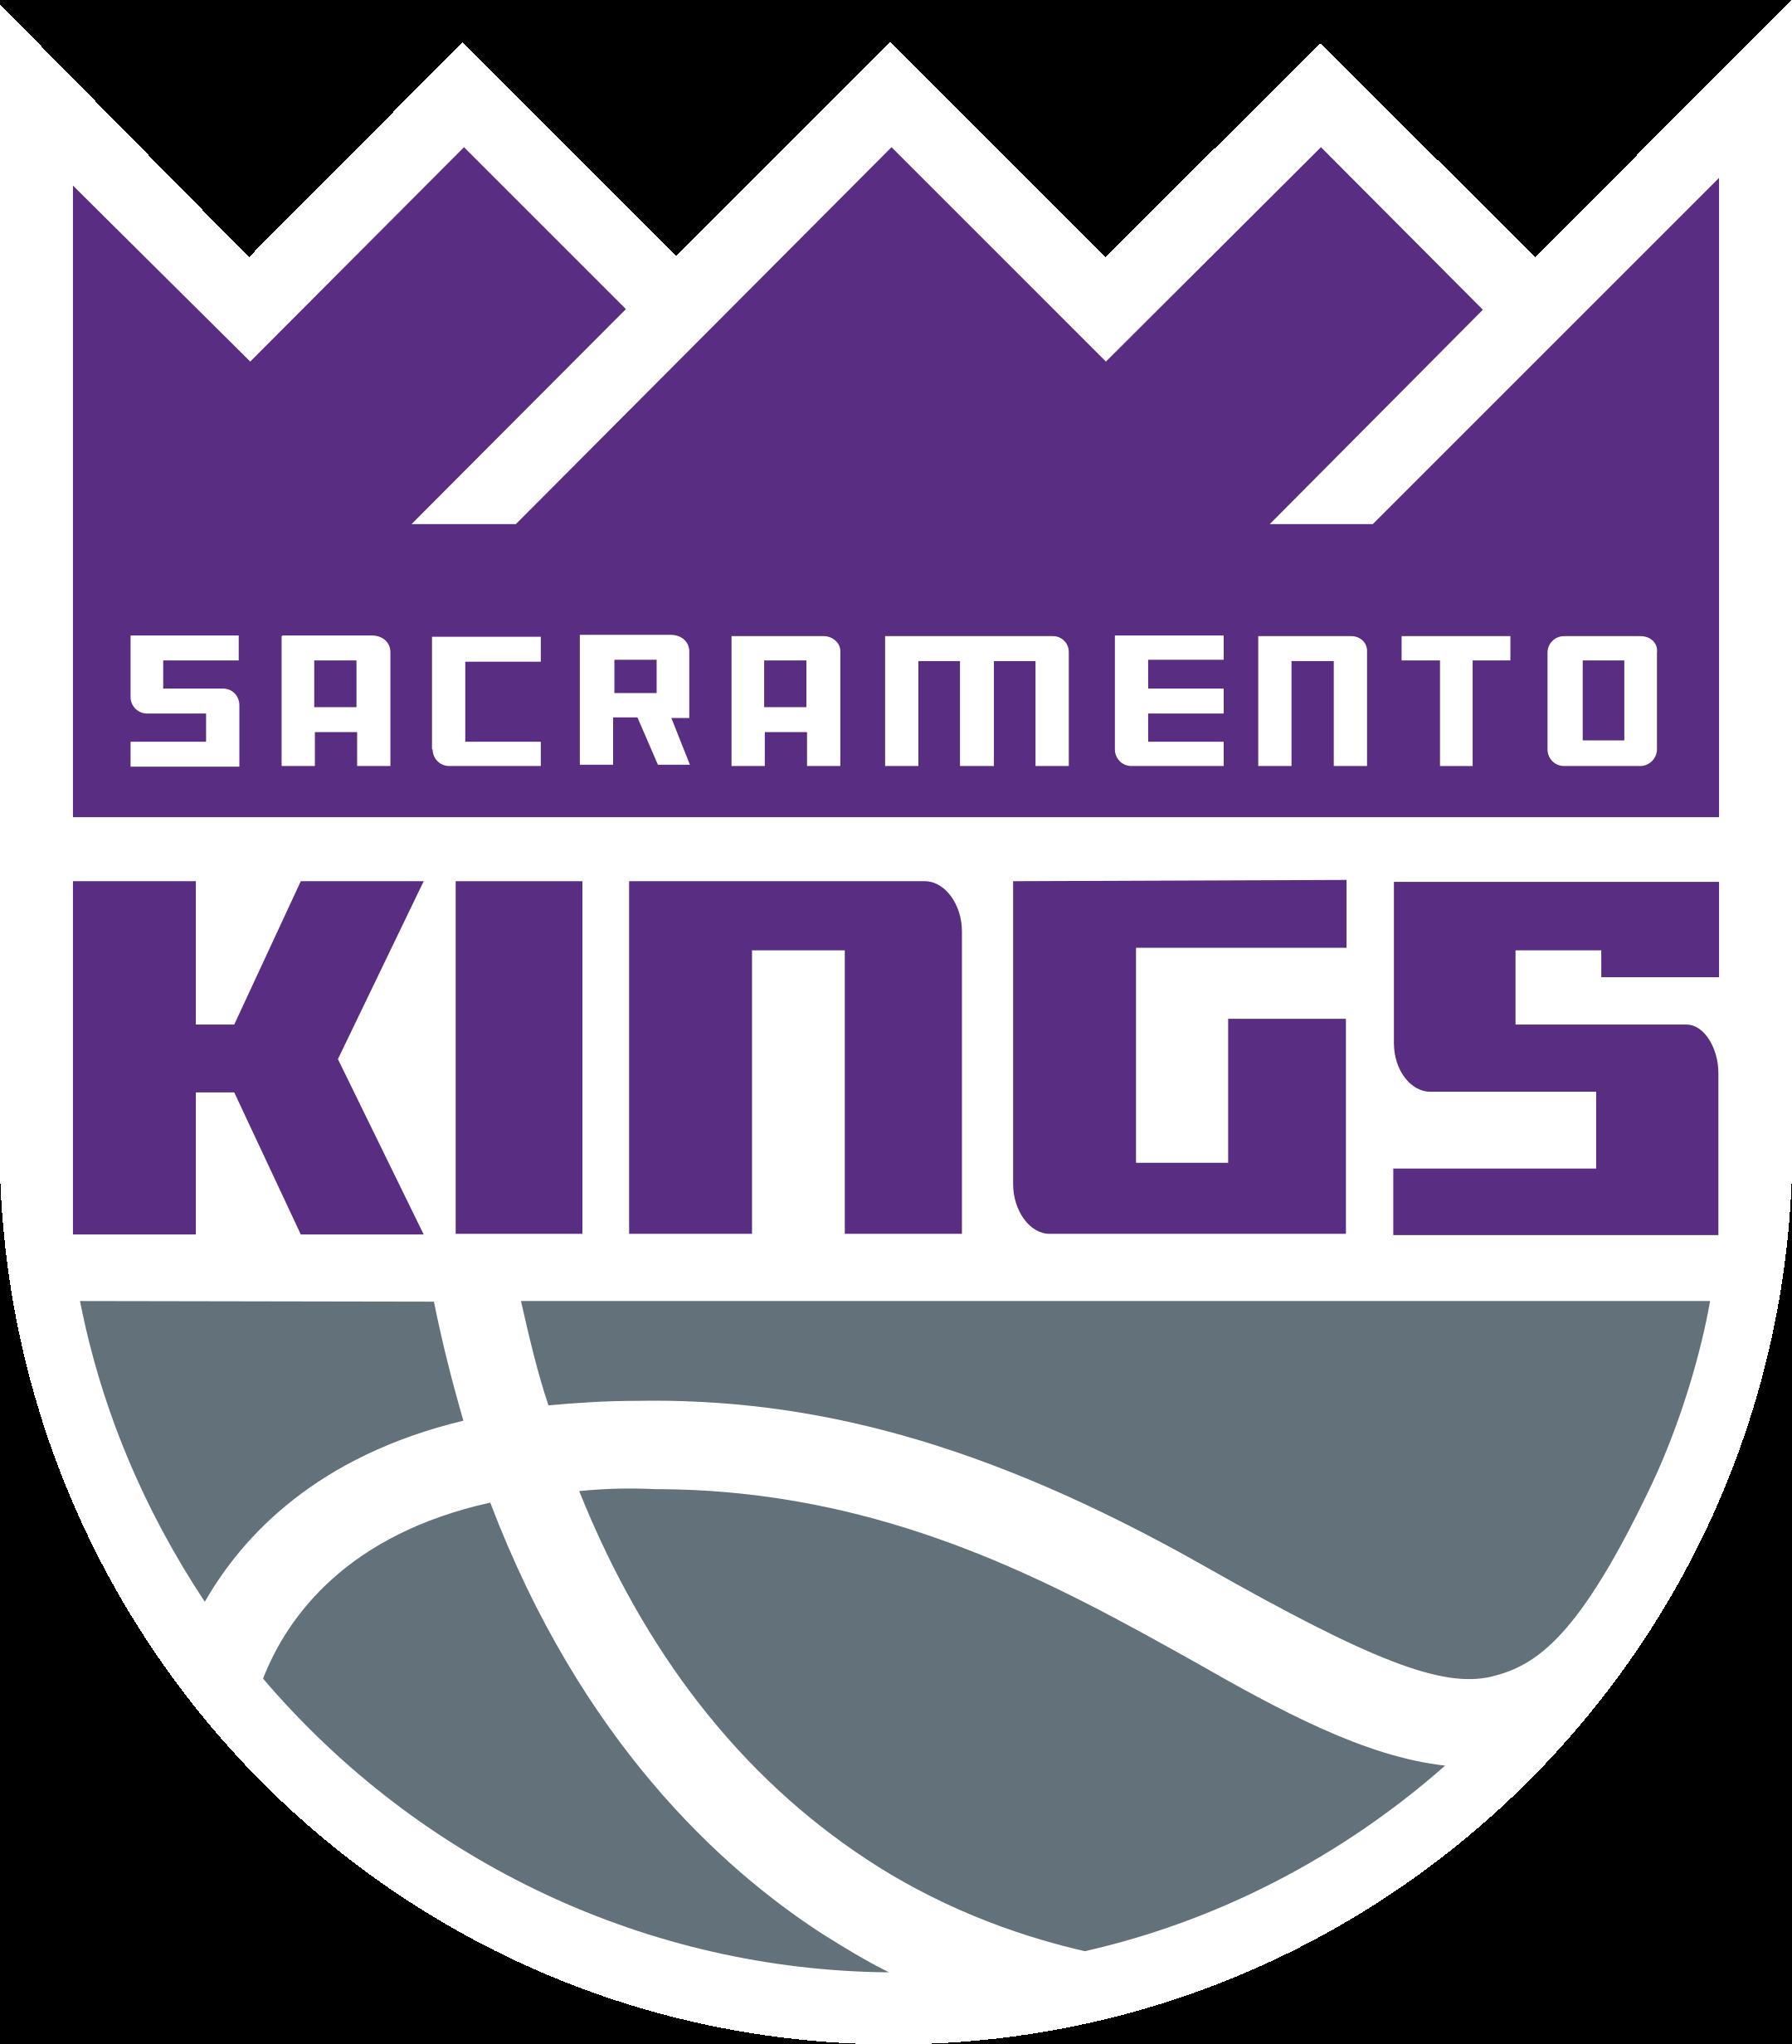 sacramento kings logo 1 - Sacramento Kings Logo